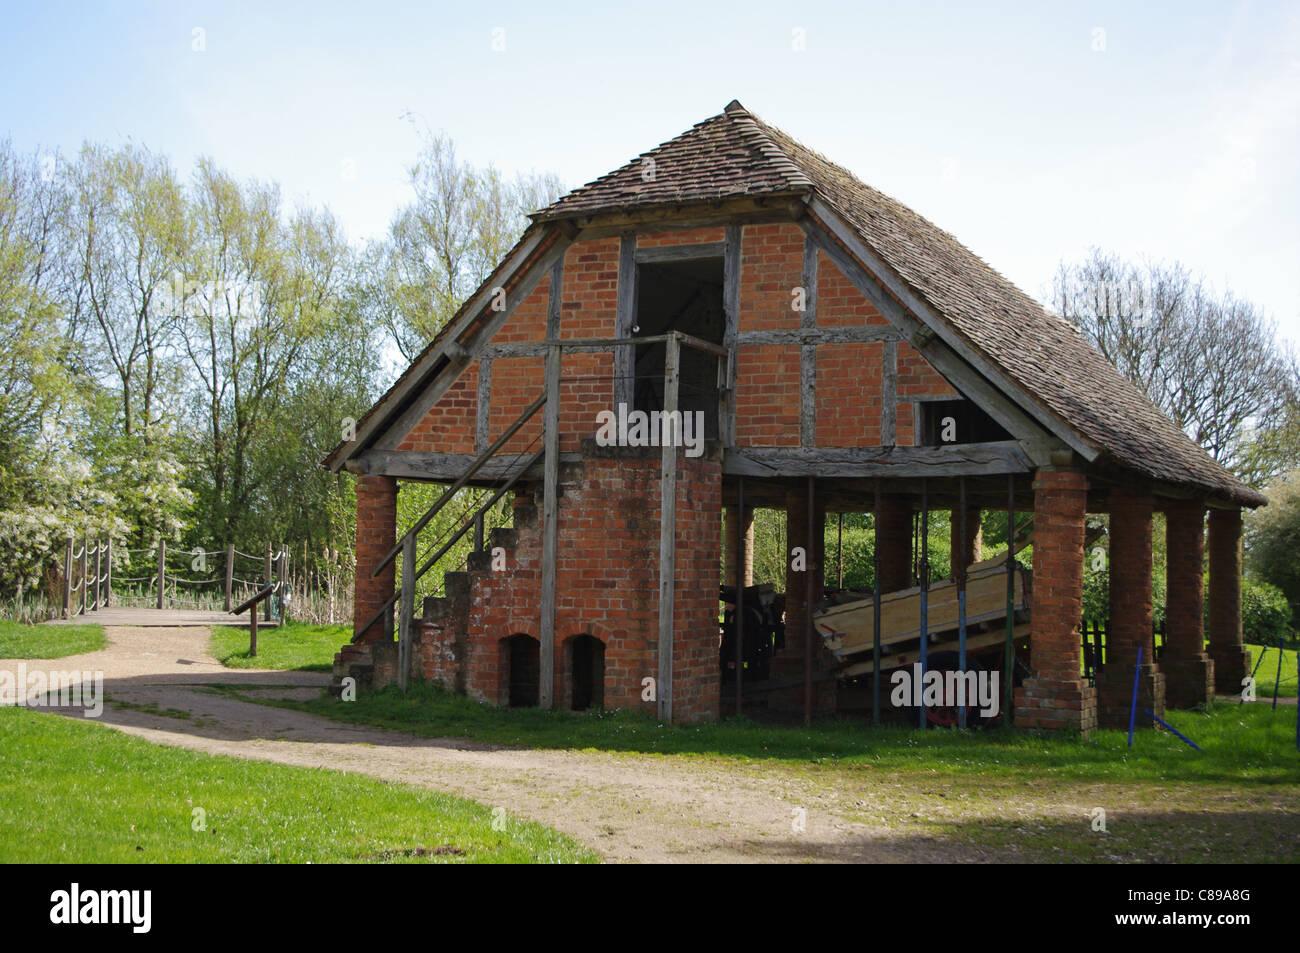 The granary, Avoncroft Museum of Buildings, Bromsgrove - Stock Image